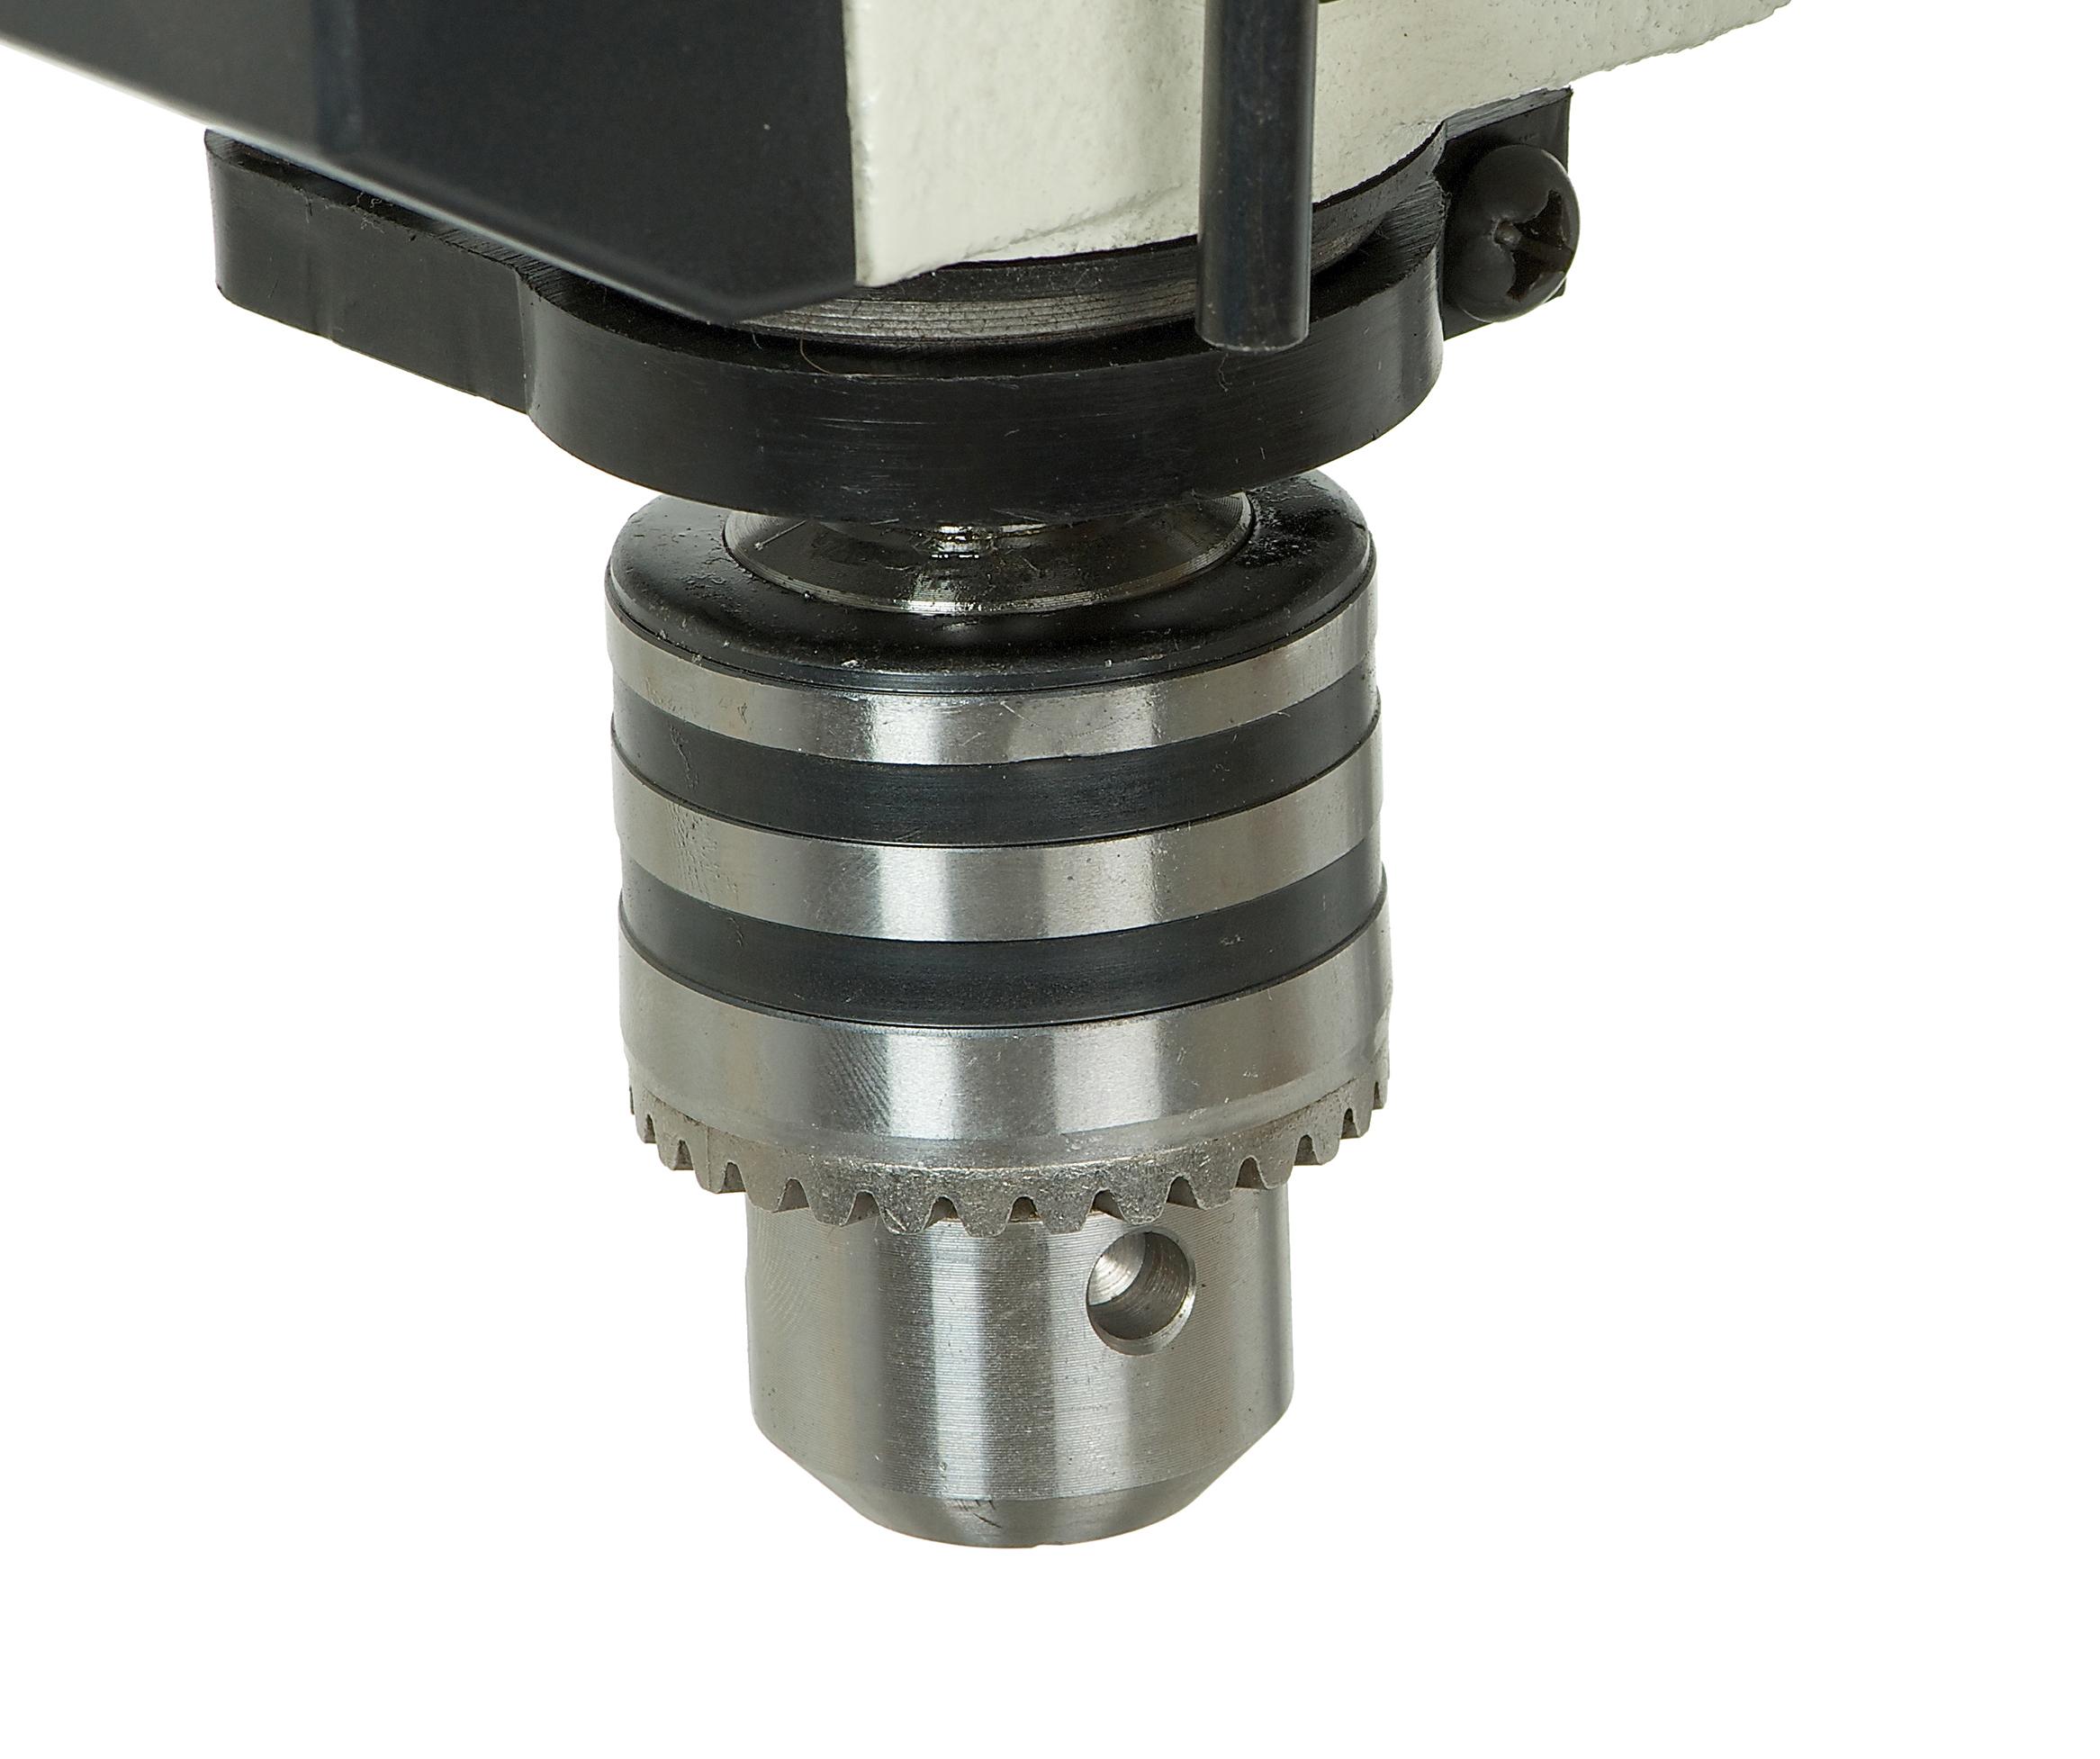 Model 30-100: 8